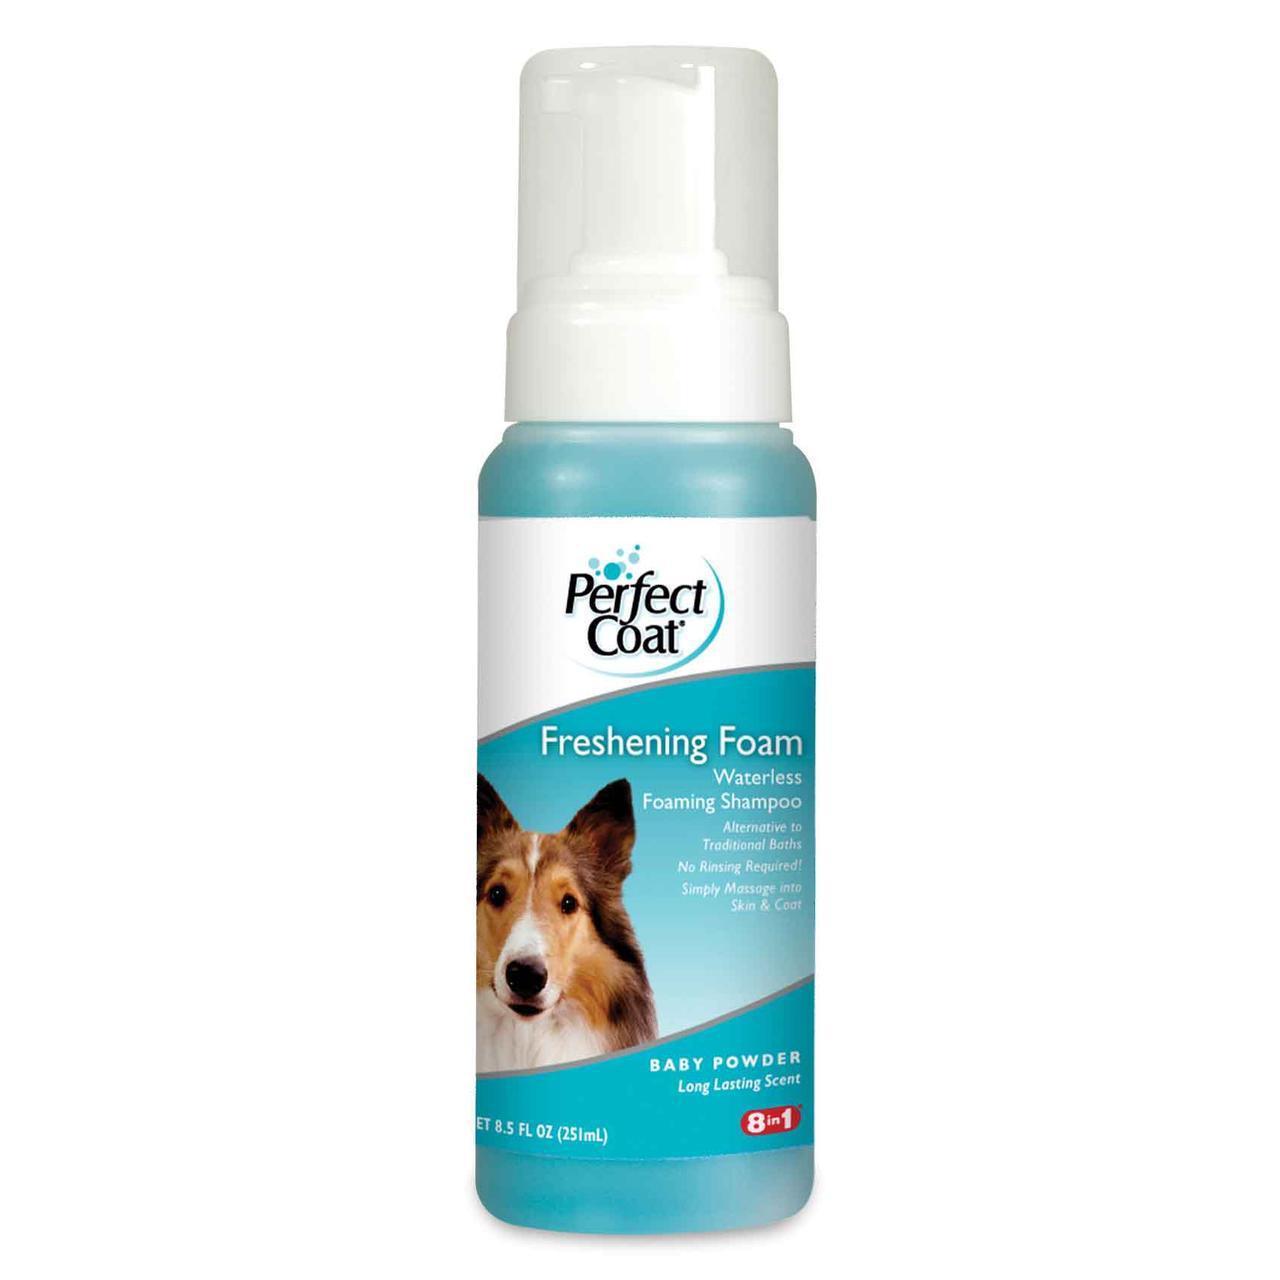 Шампунь-пена 8 in 1 Waterless Foam Shampoo для собак безводный, 251 мл